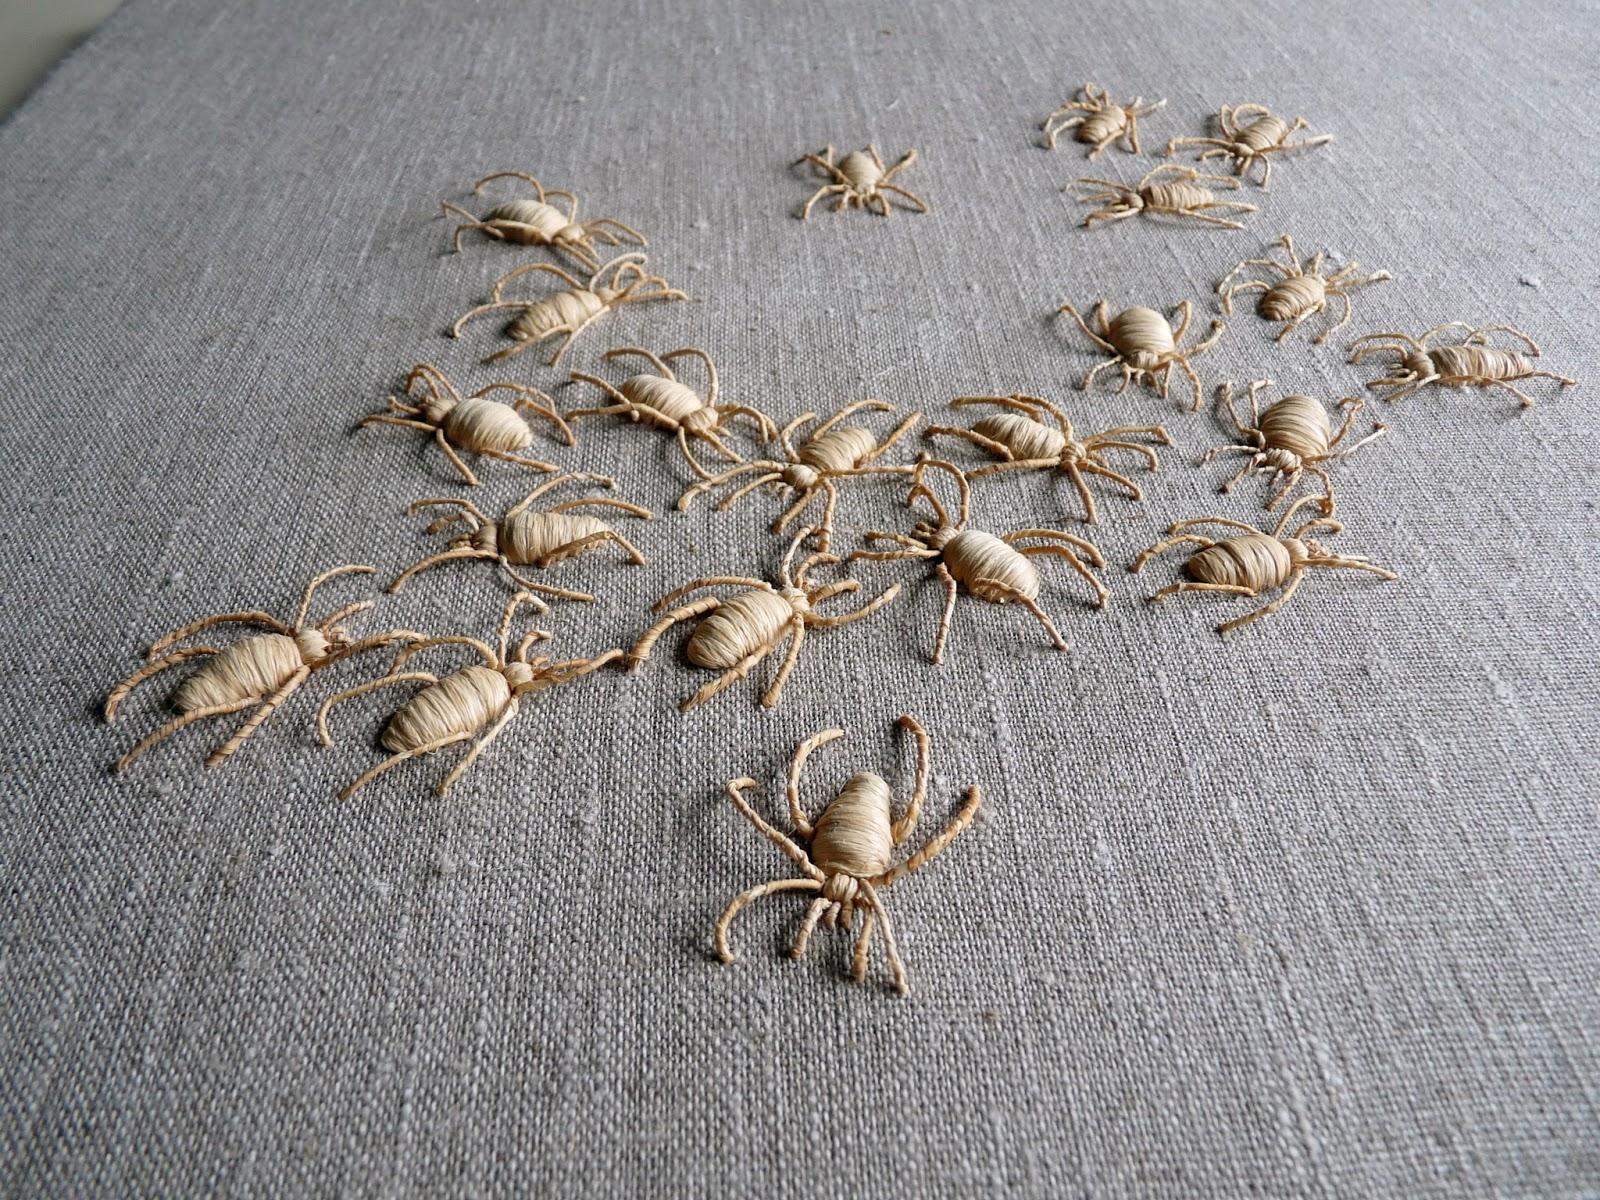 http://3.bp.blogspot.com/-Y7jSC3bII2E/UcQiew2NPgI/AAAAAAAAAU8/ANzuFXcAdro/s1600/Insectomanie+VI.jpg